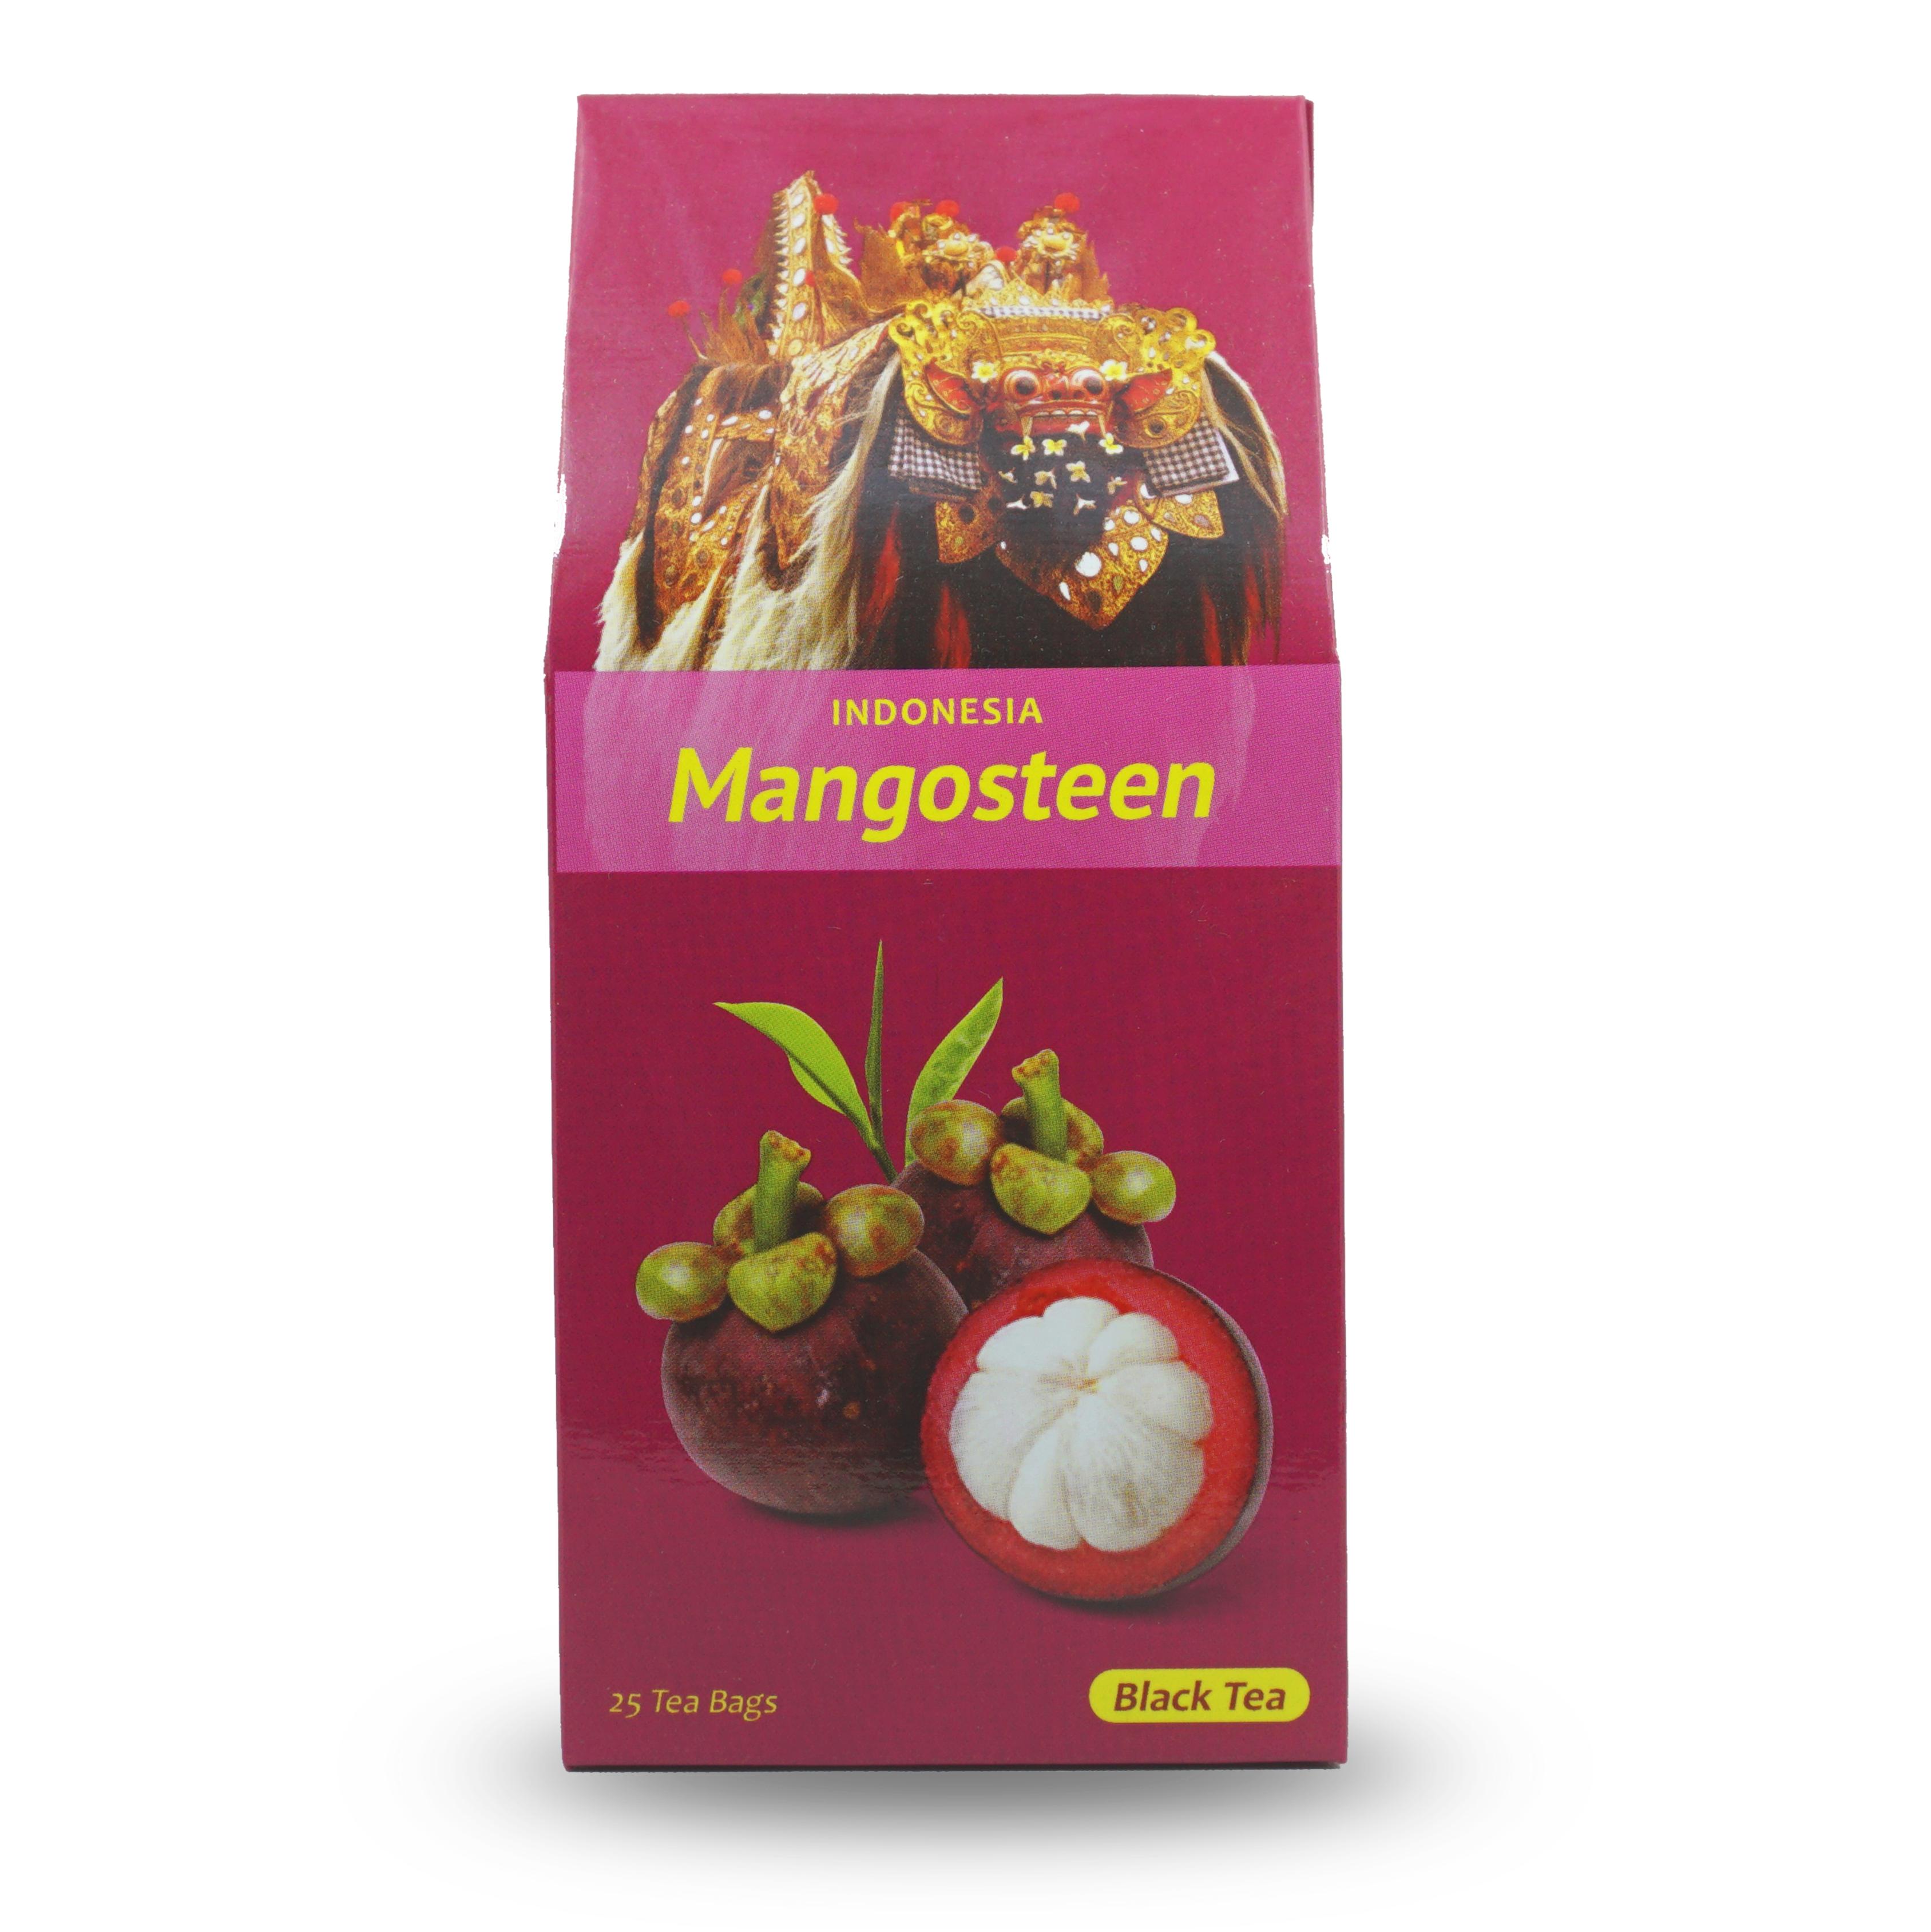 teh kotak mangosteen fruit 25 bags kopi bali cap kupu kupu bola dunia pt putra bhineka perkasa teh kotak mangosteen fruit 25 bags